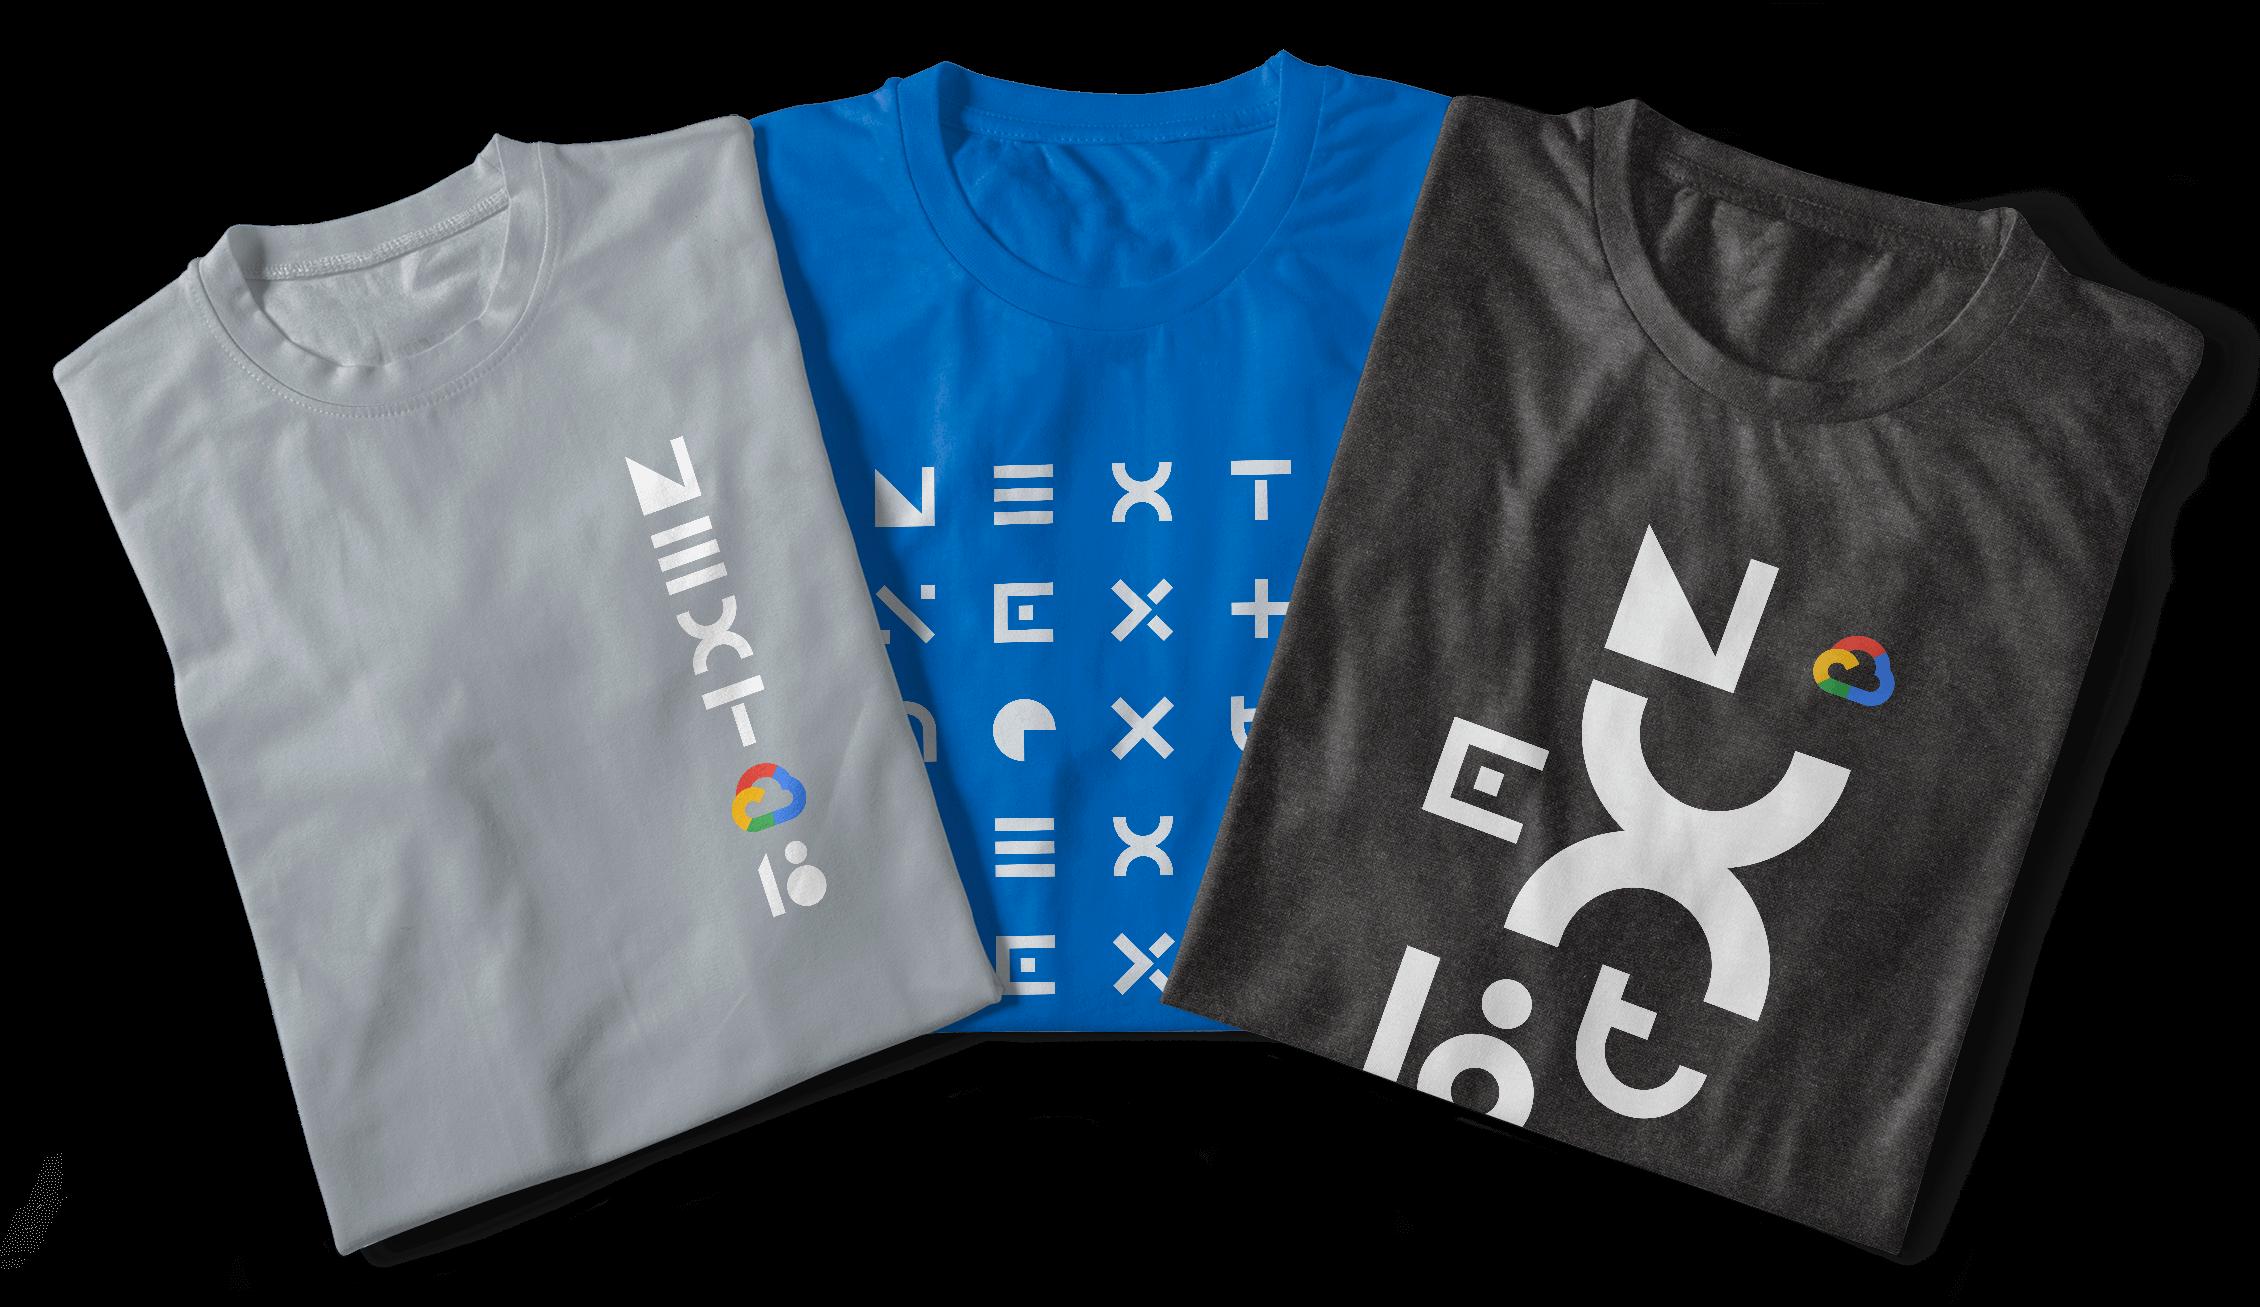 shirts (1).png